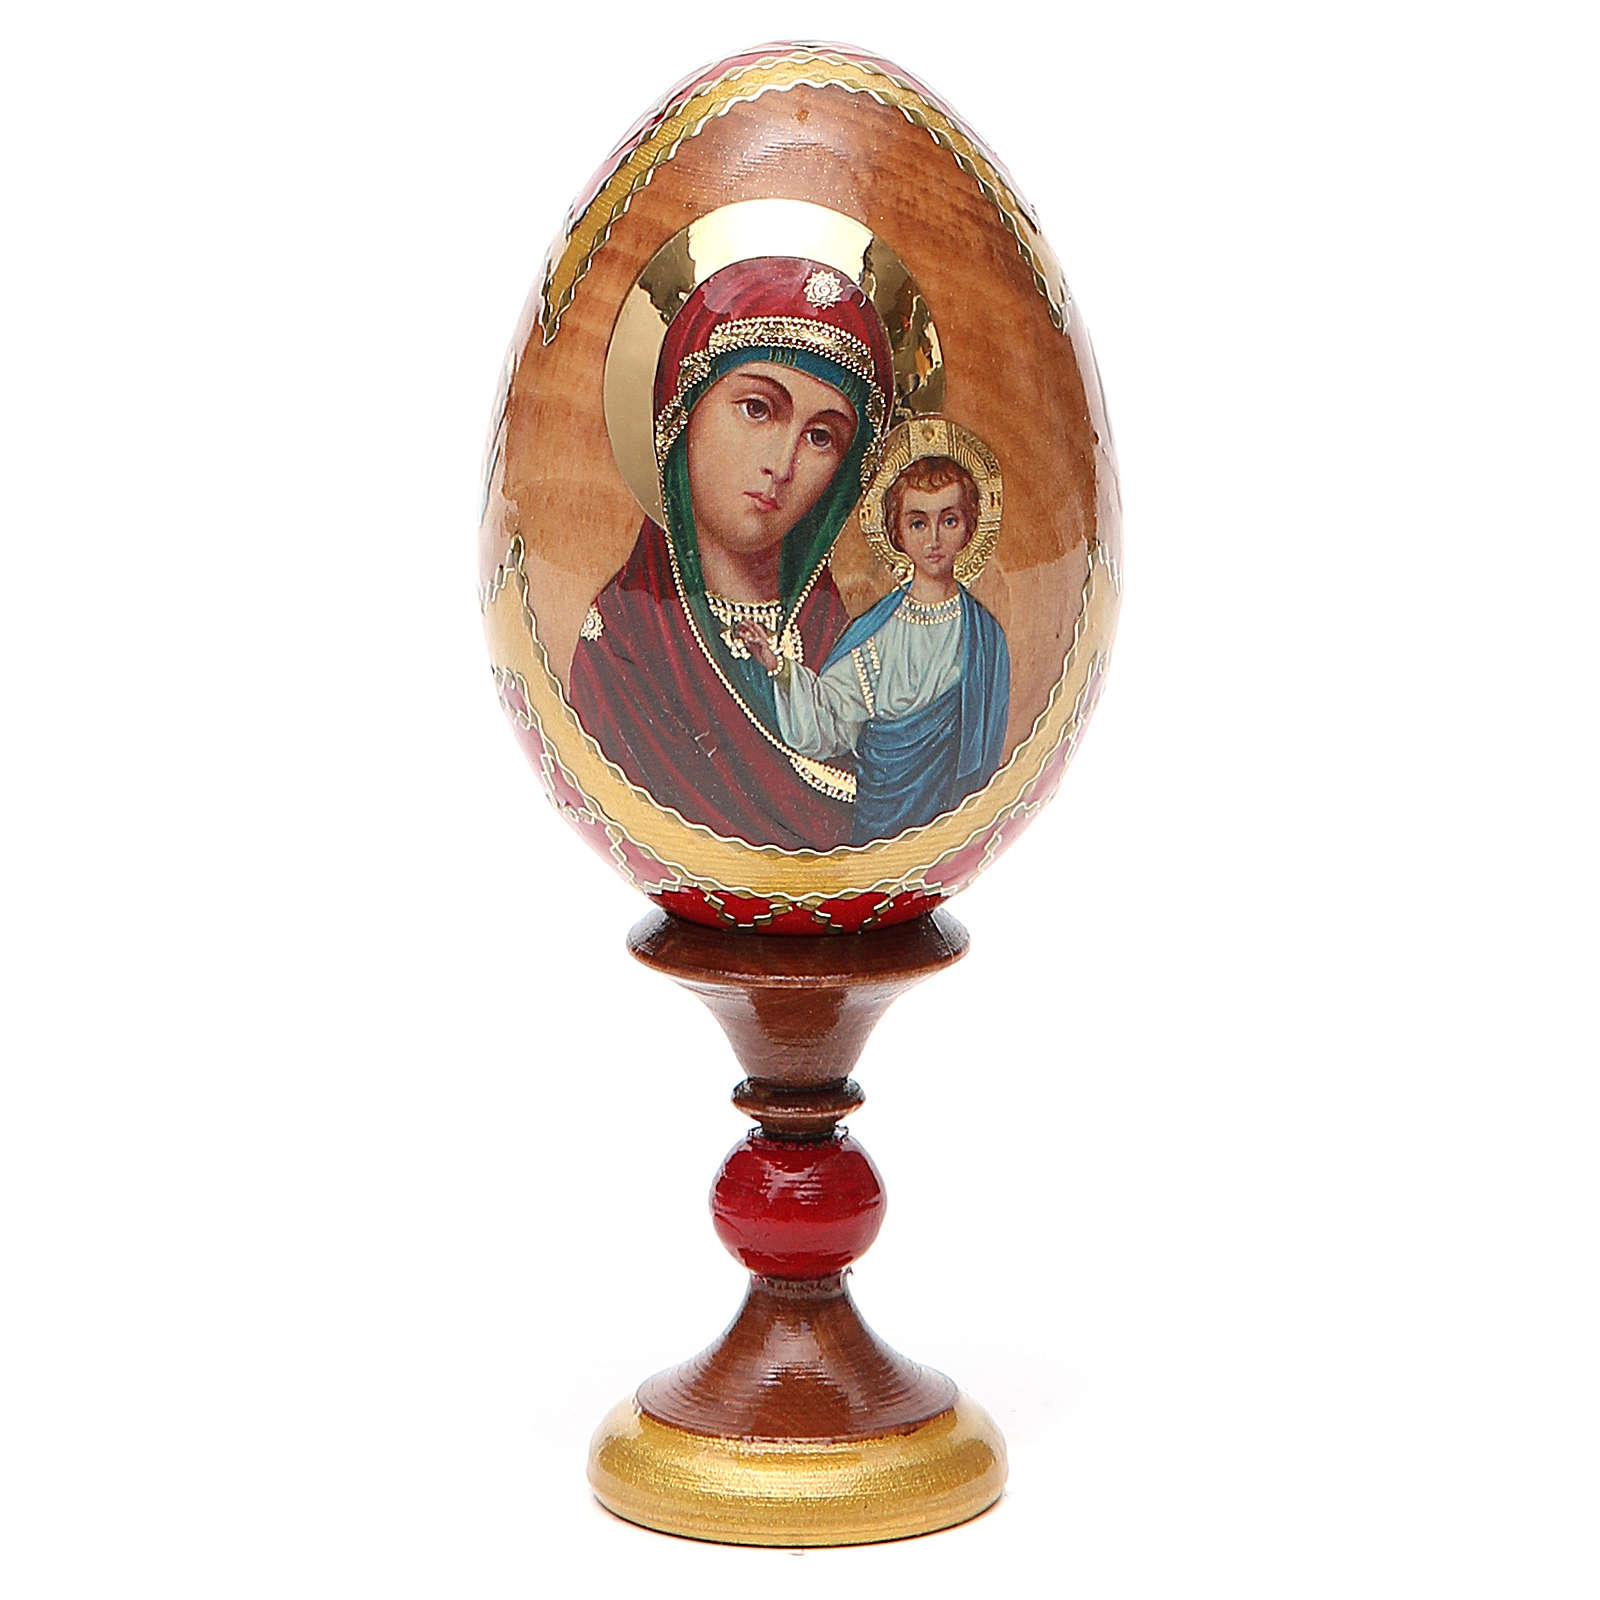 Huevo ruso de madera découpage Kazanskaya altura total 13 cm estilo Fabergé 4